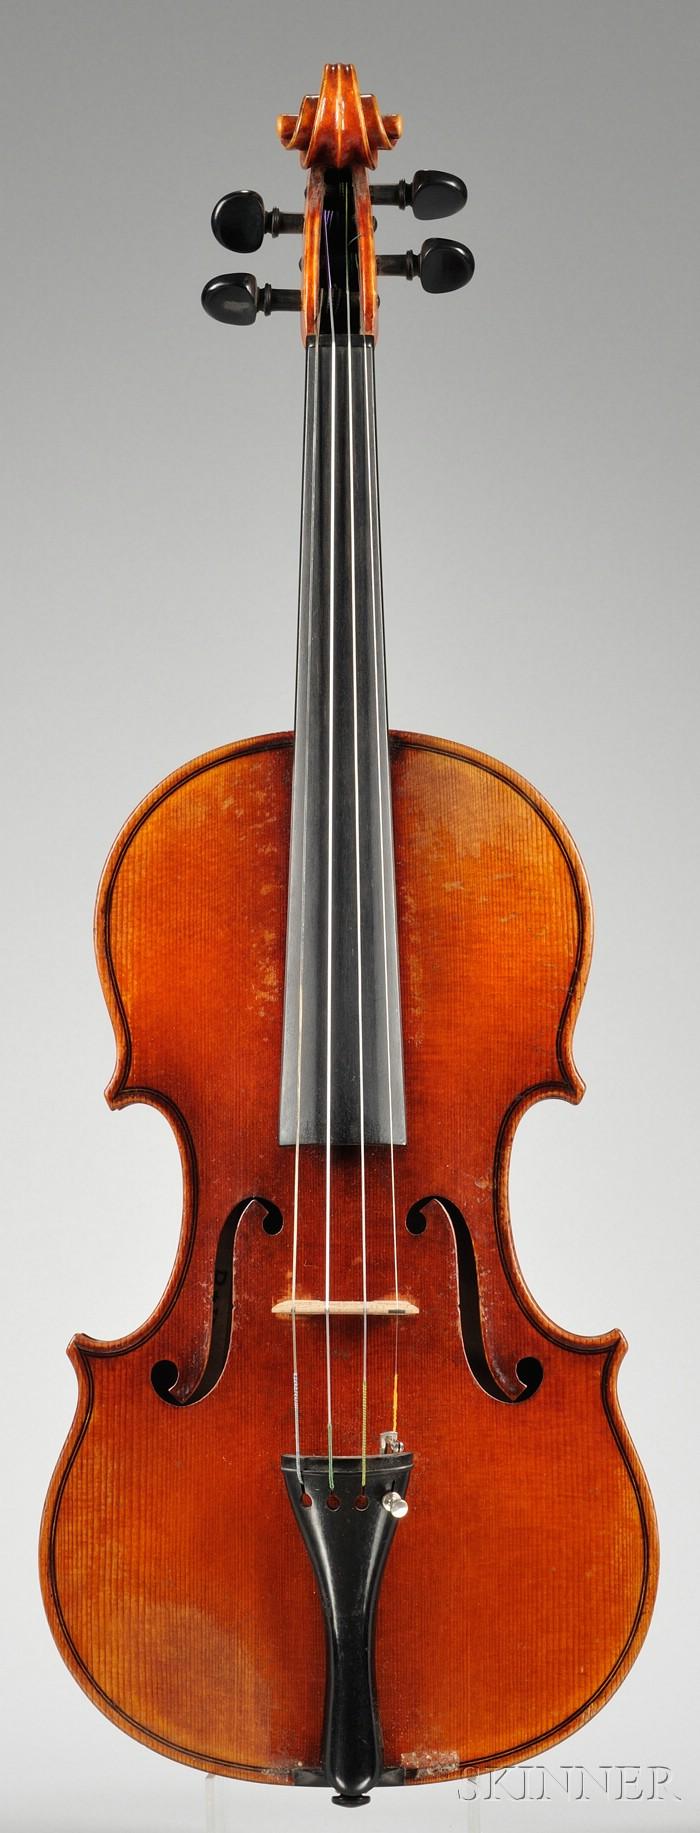 Markneukirchen Violin, Paul Knorr, 1944